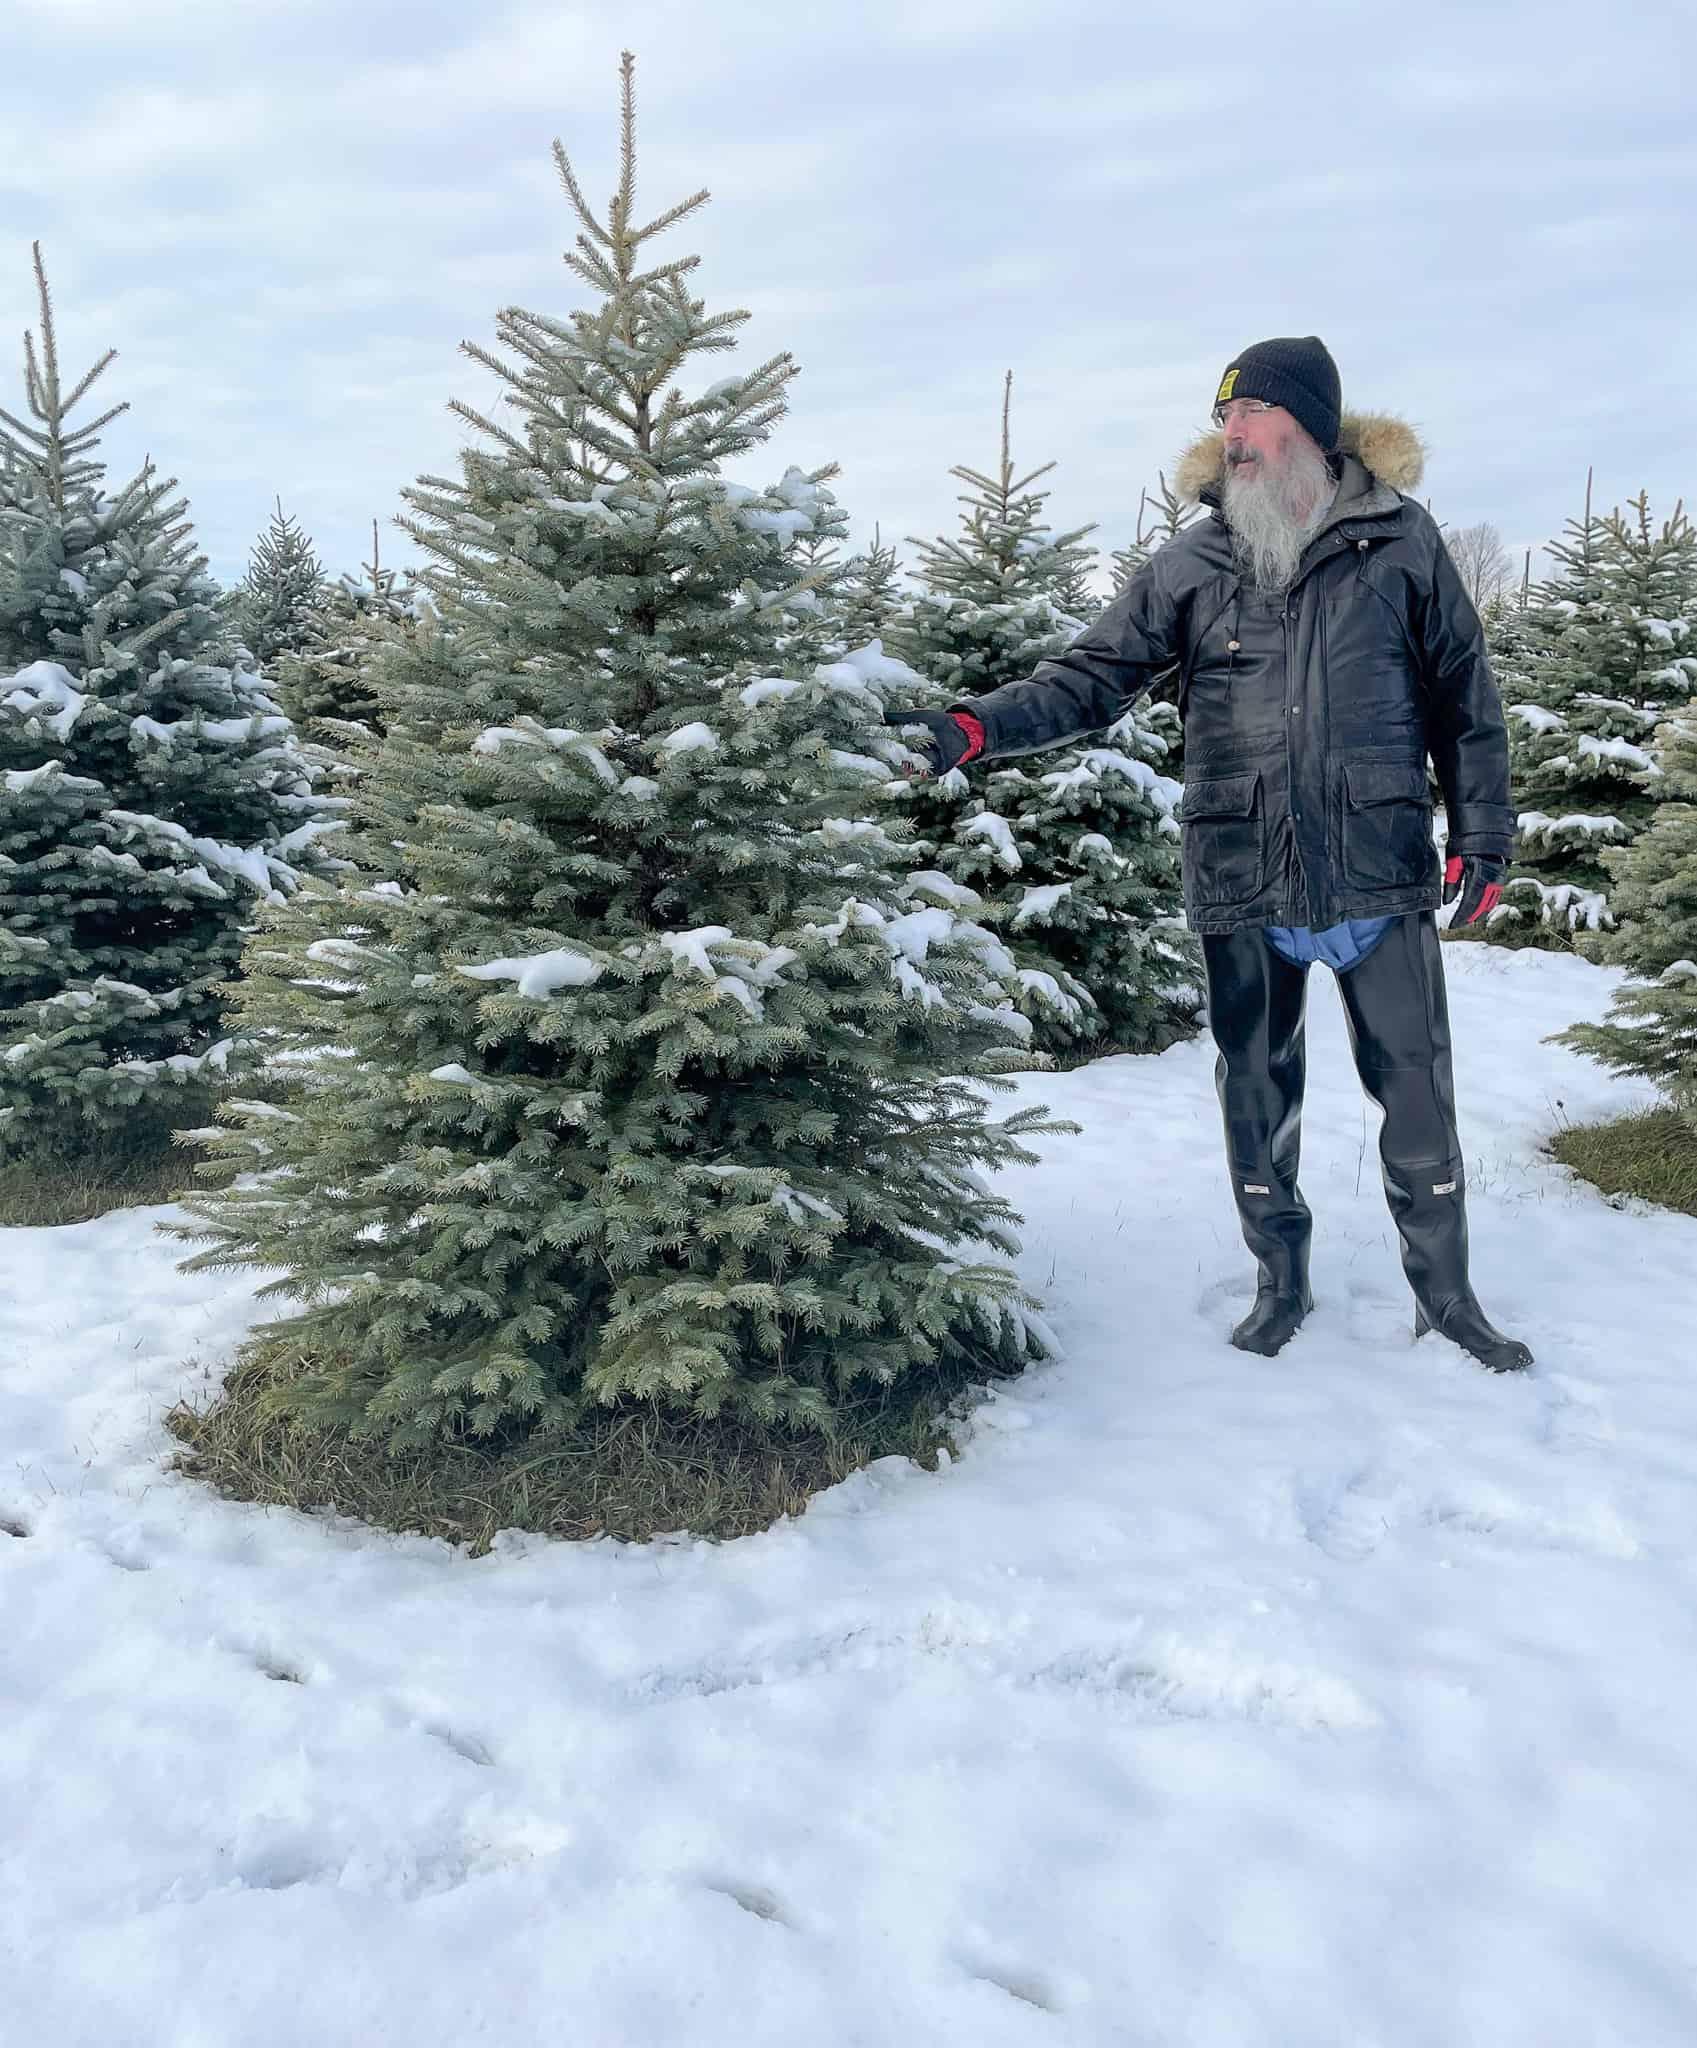 Cut your own tree at Tallboots Farm